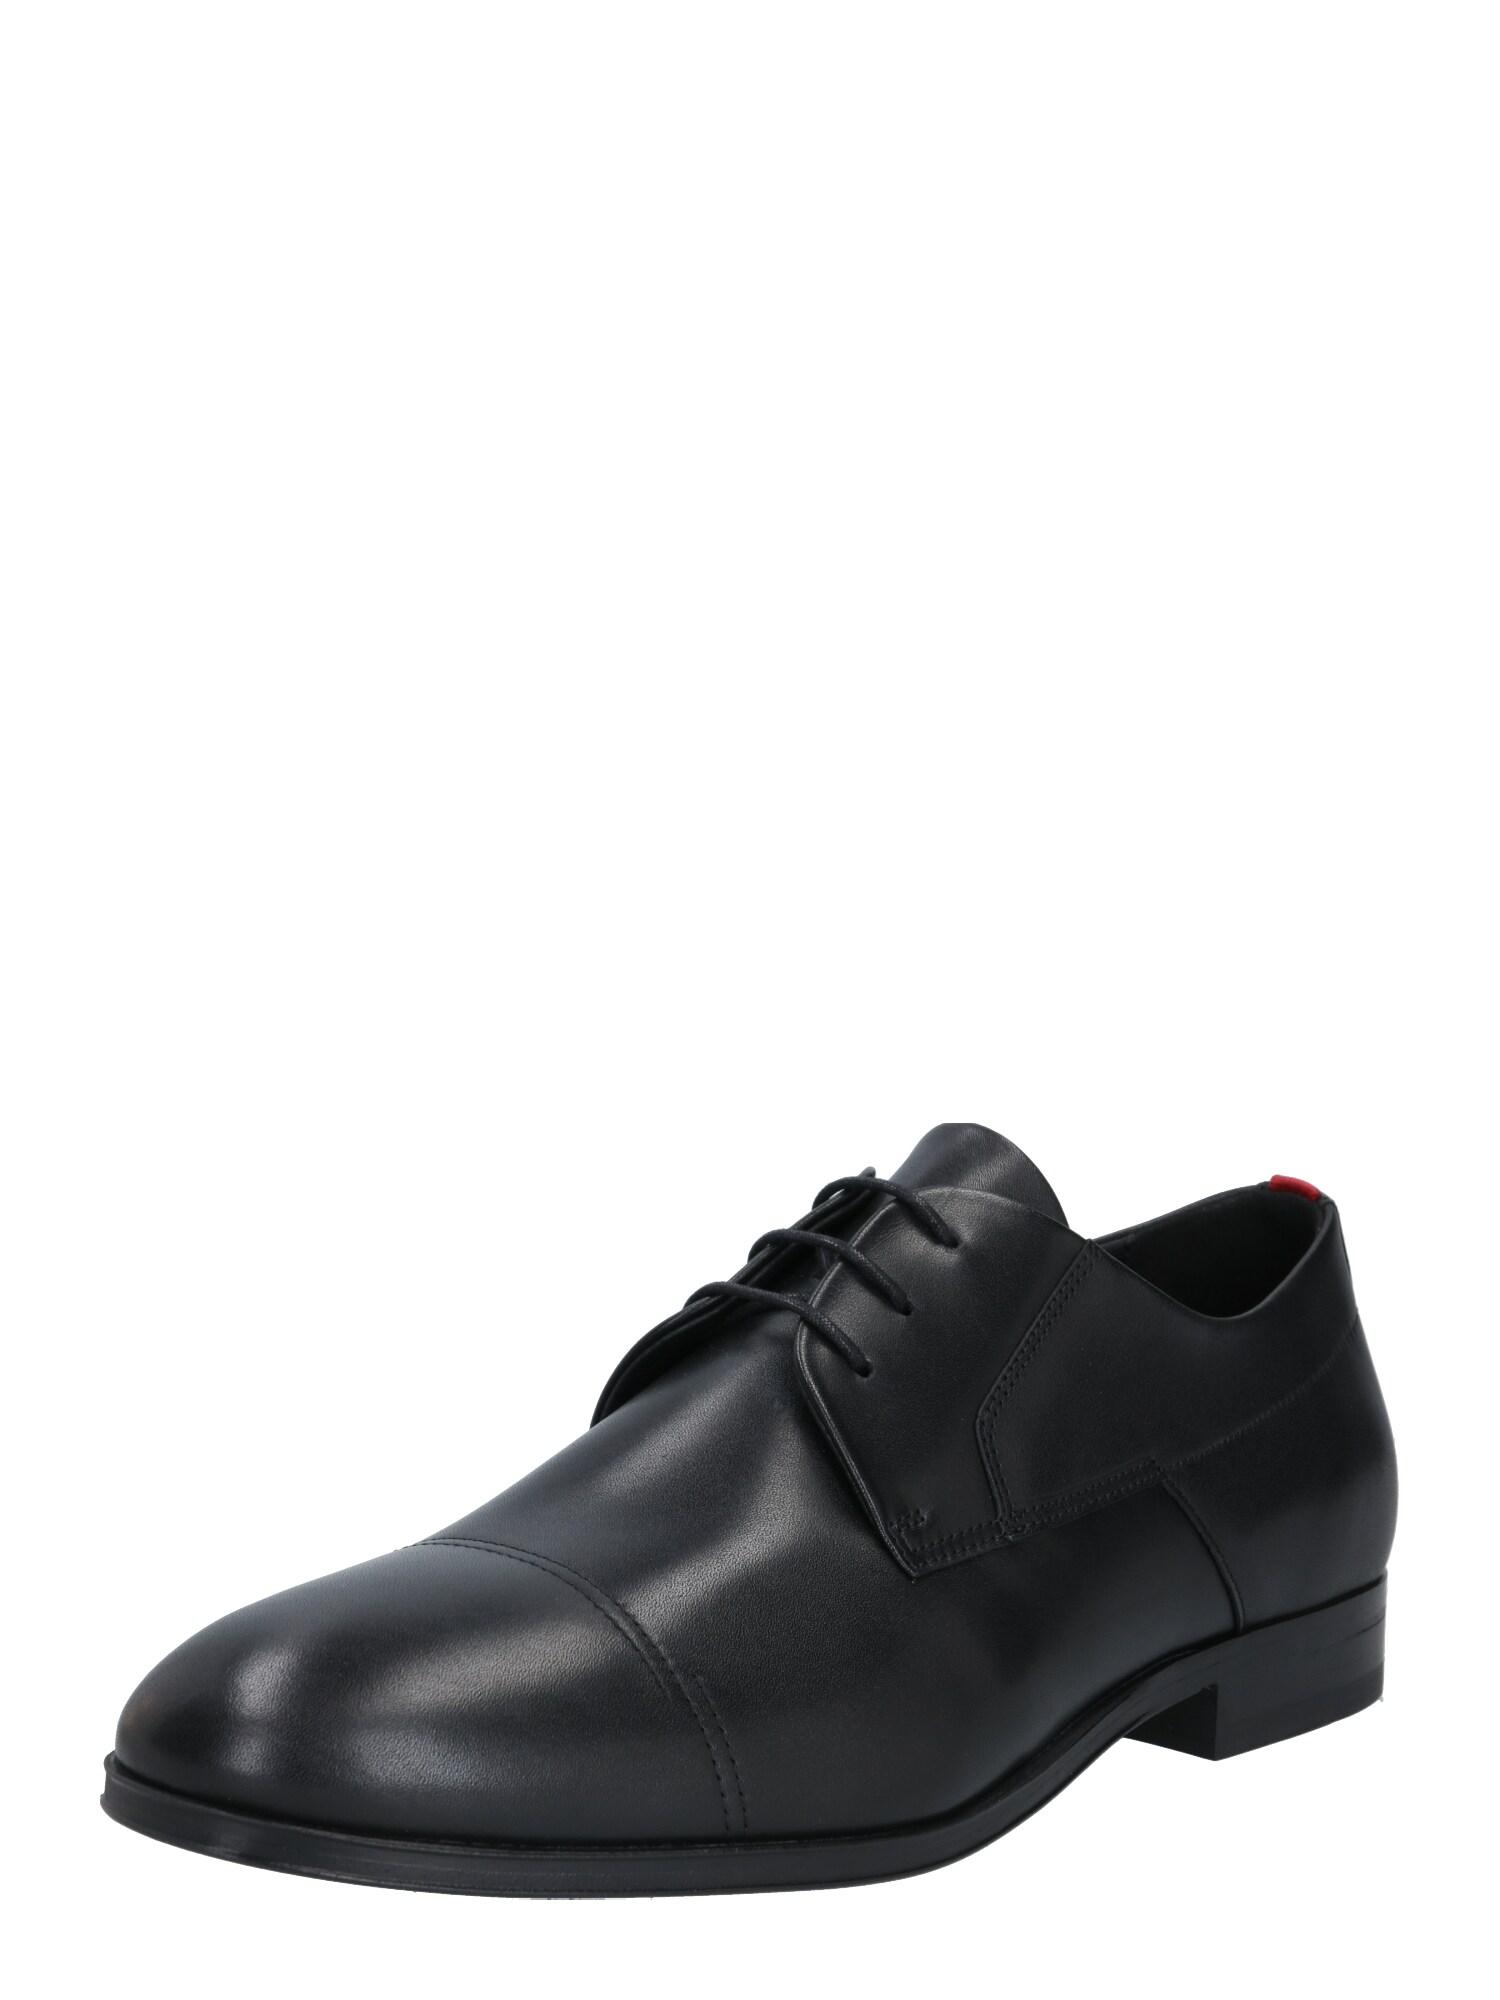 HUGO Šněrovací boty 'Boheme'  černá